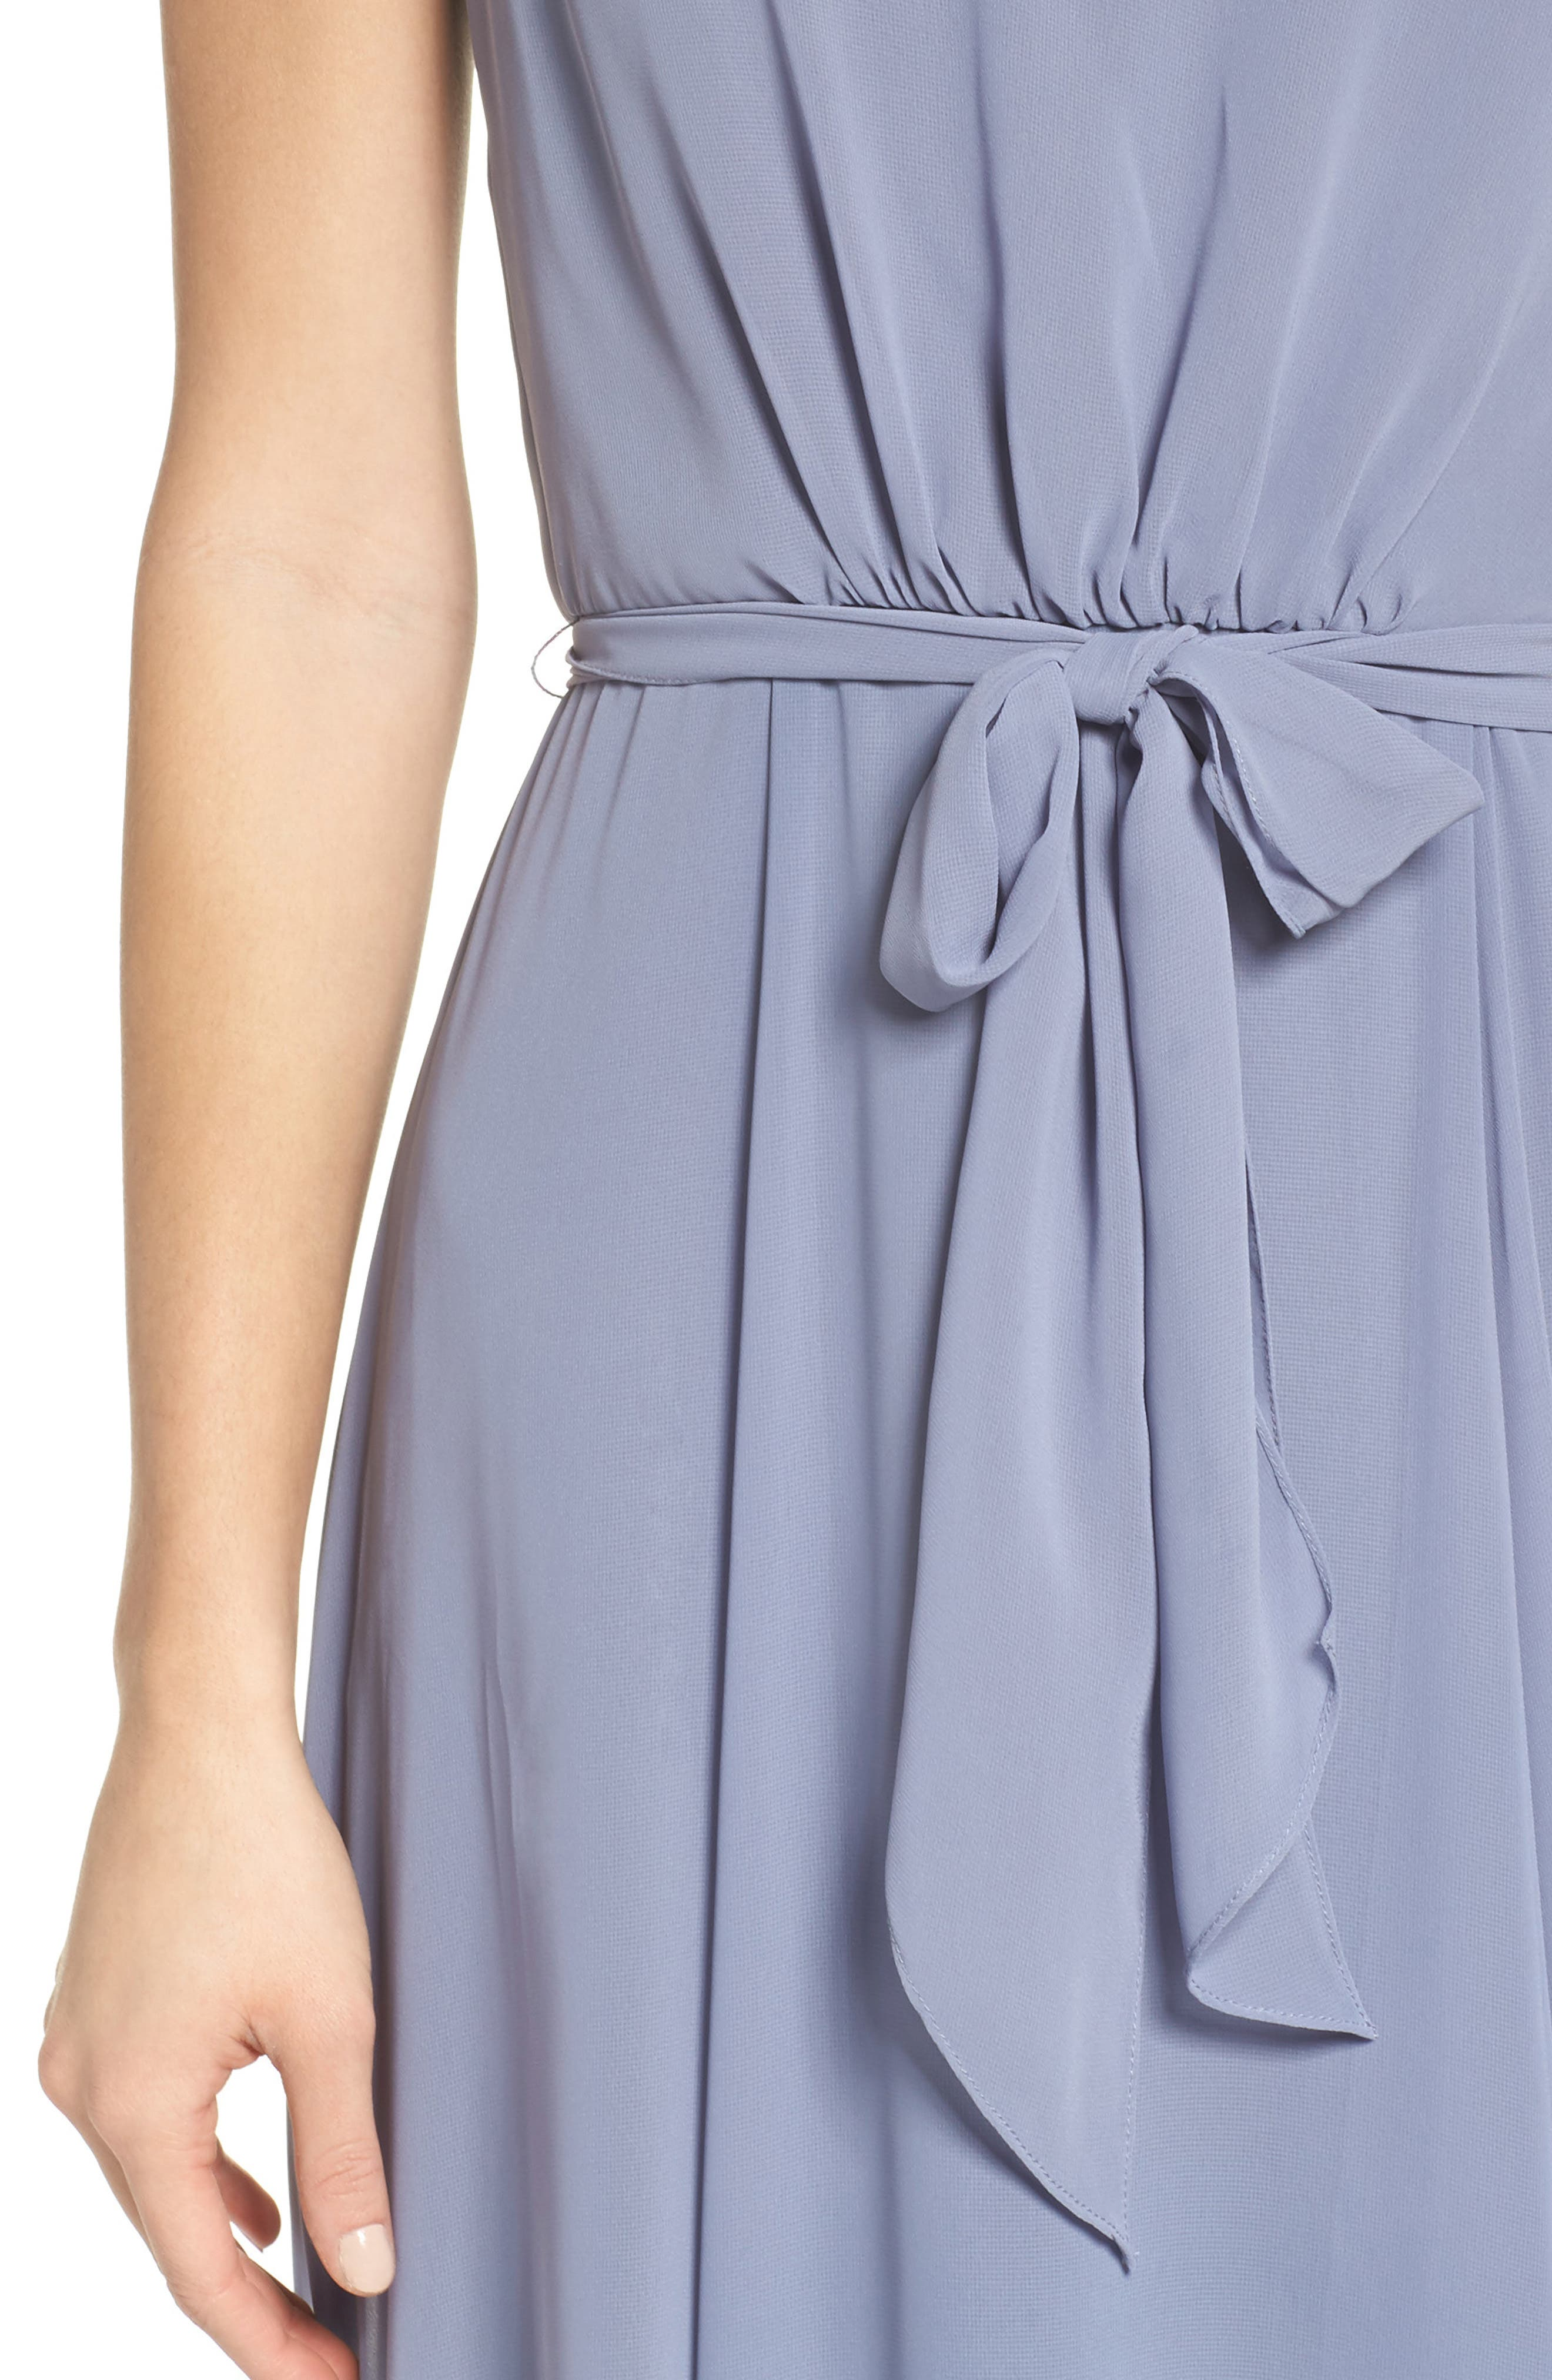 One-Shoulder Chiffon A-Line Gown,                             Alternate thumbnail 4, color,                             020